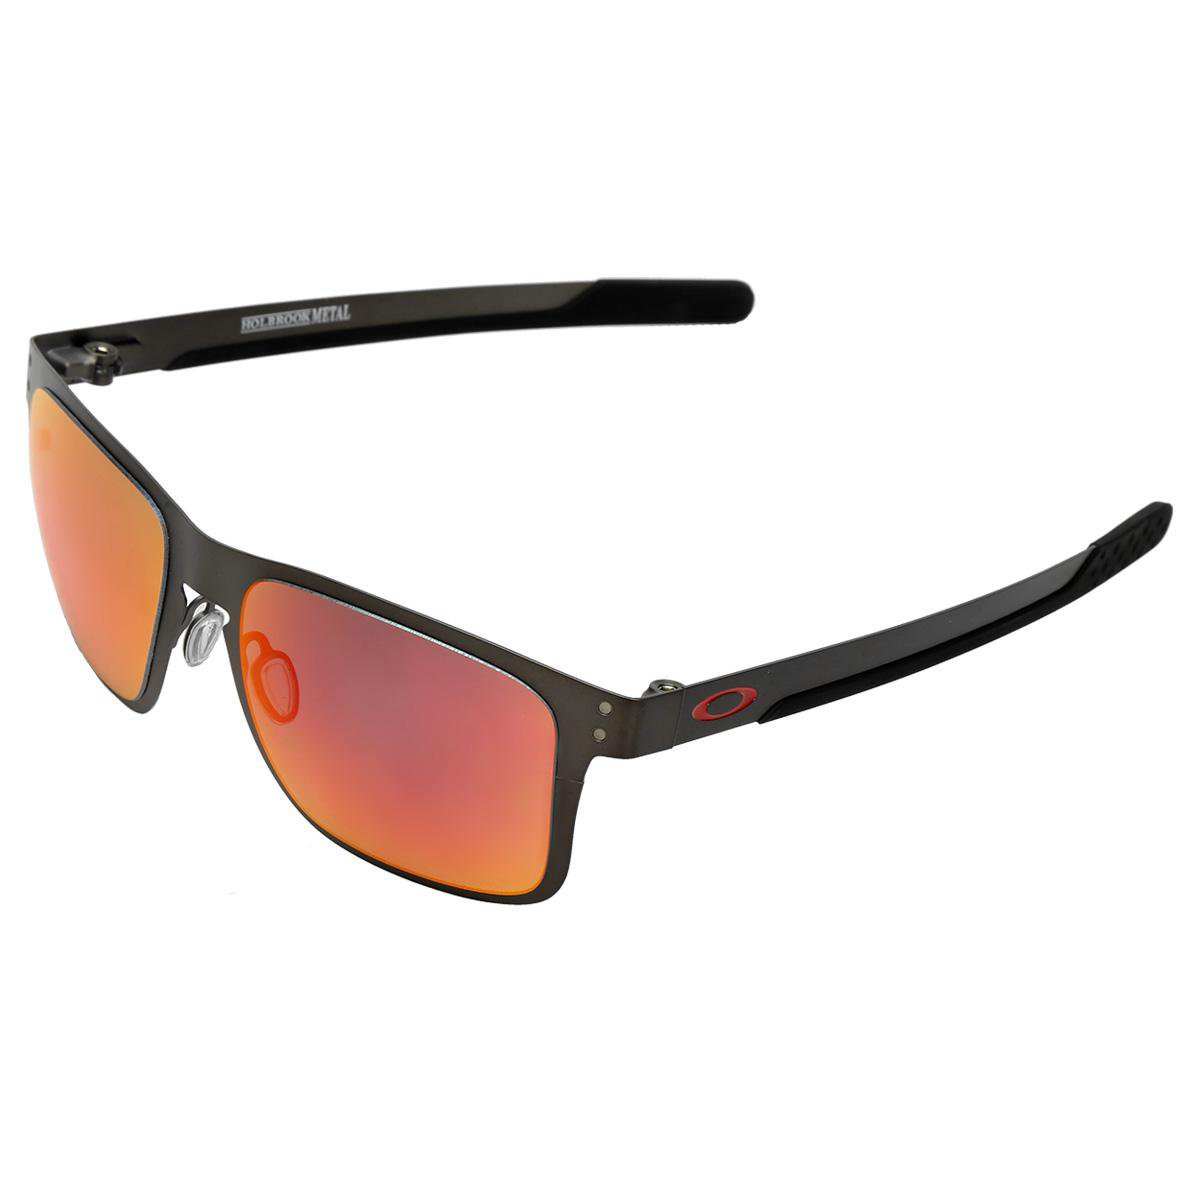 7282d0962f154 Oculos Feminino Oakley Dart Preço – Southern California Weather Force